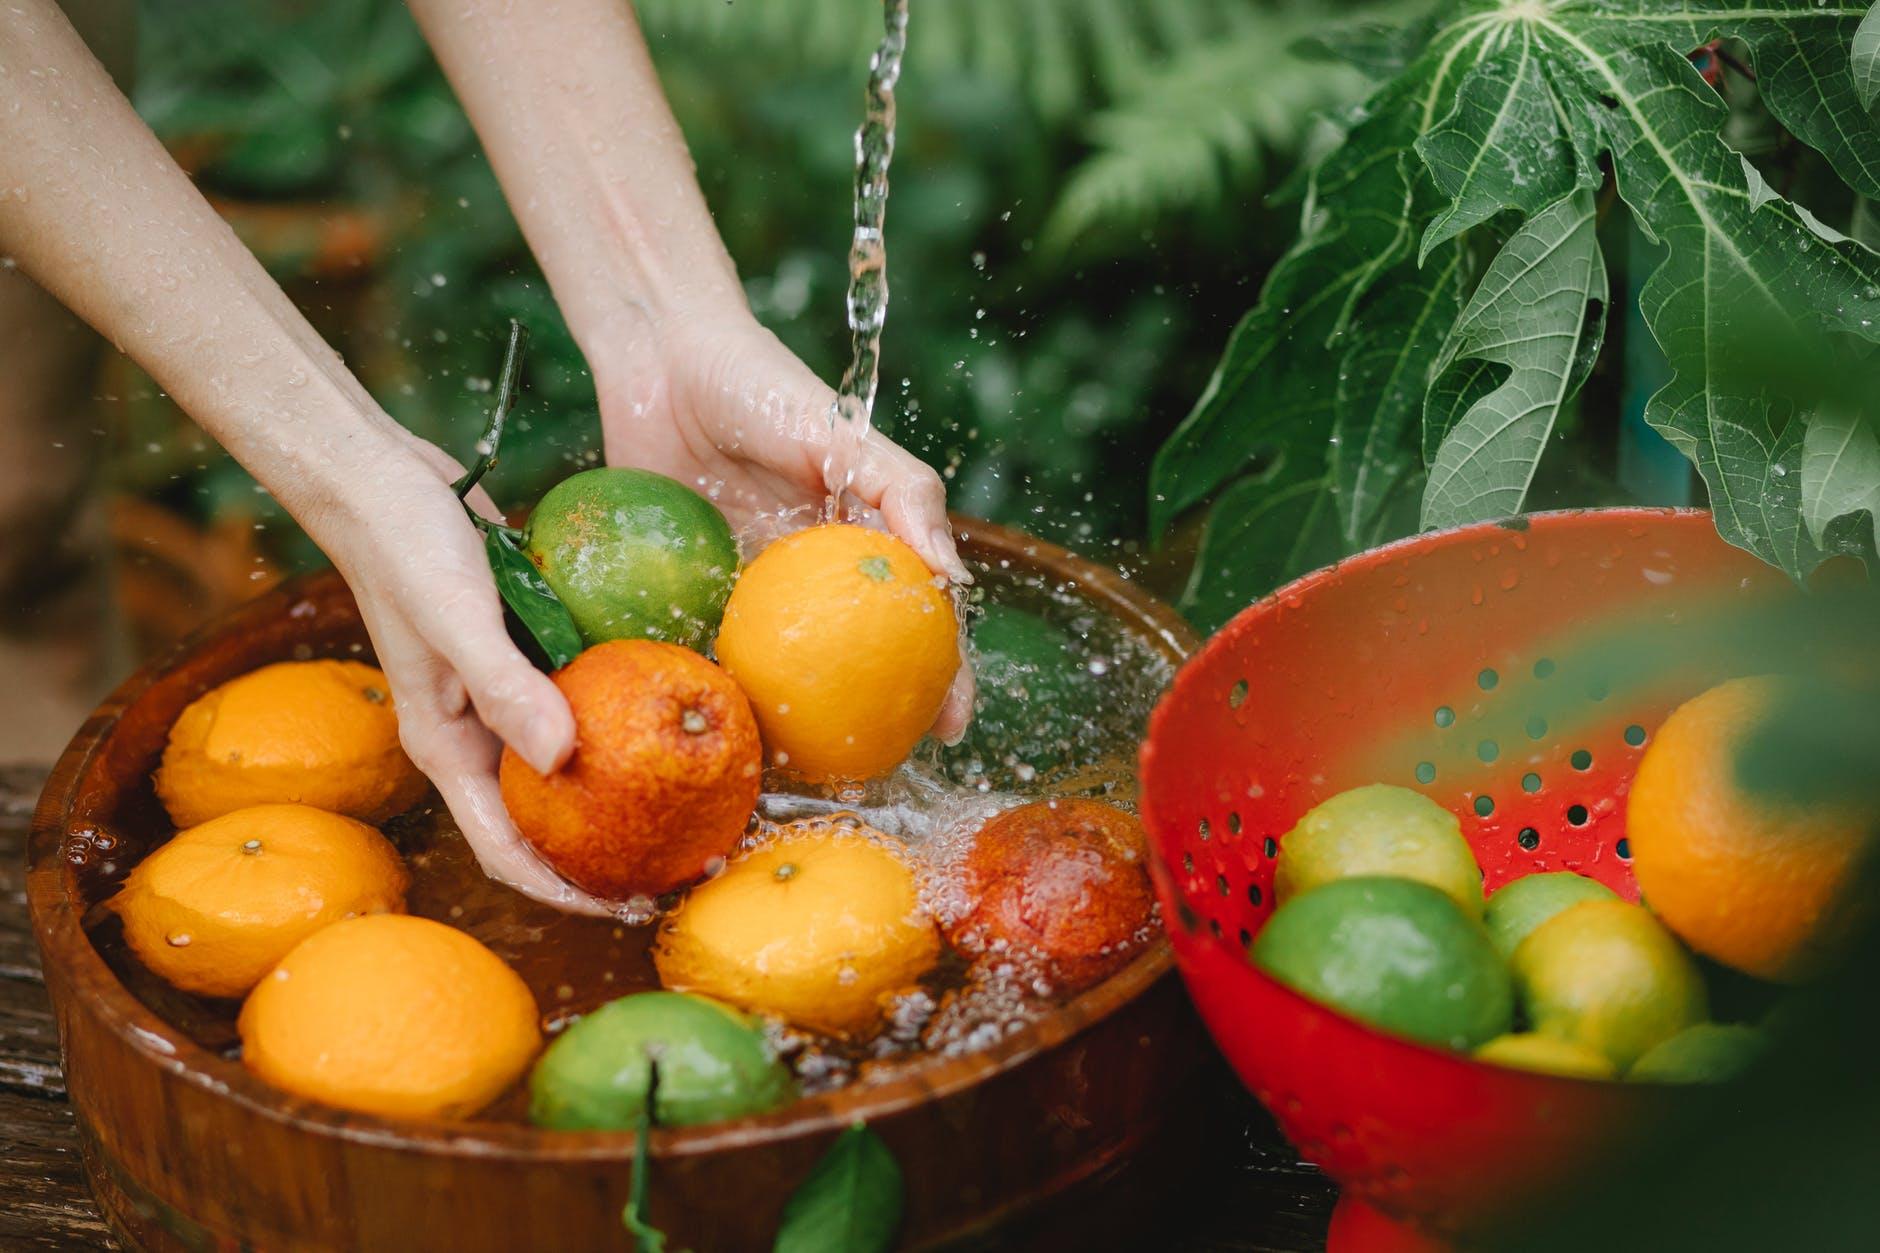 woman washing fresh fruits in tropical orchard